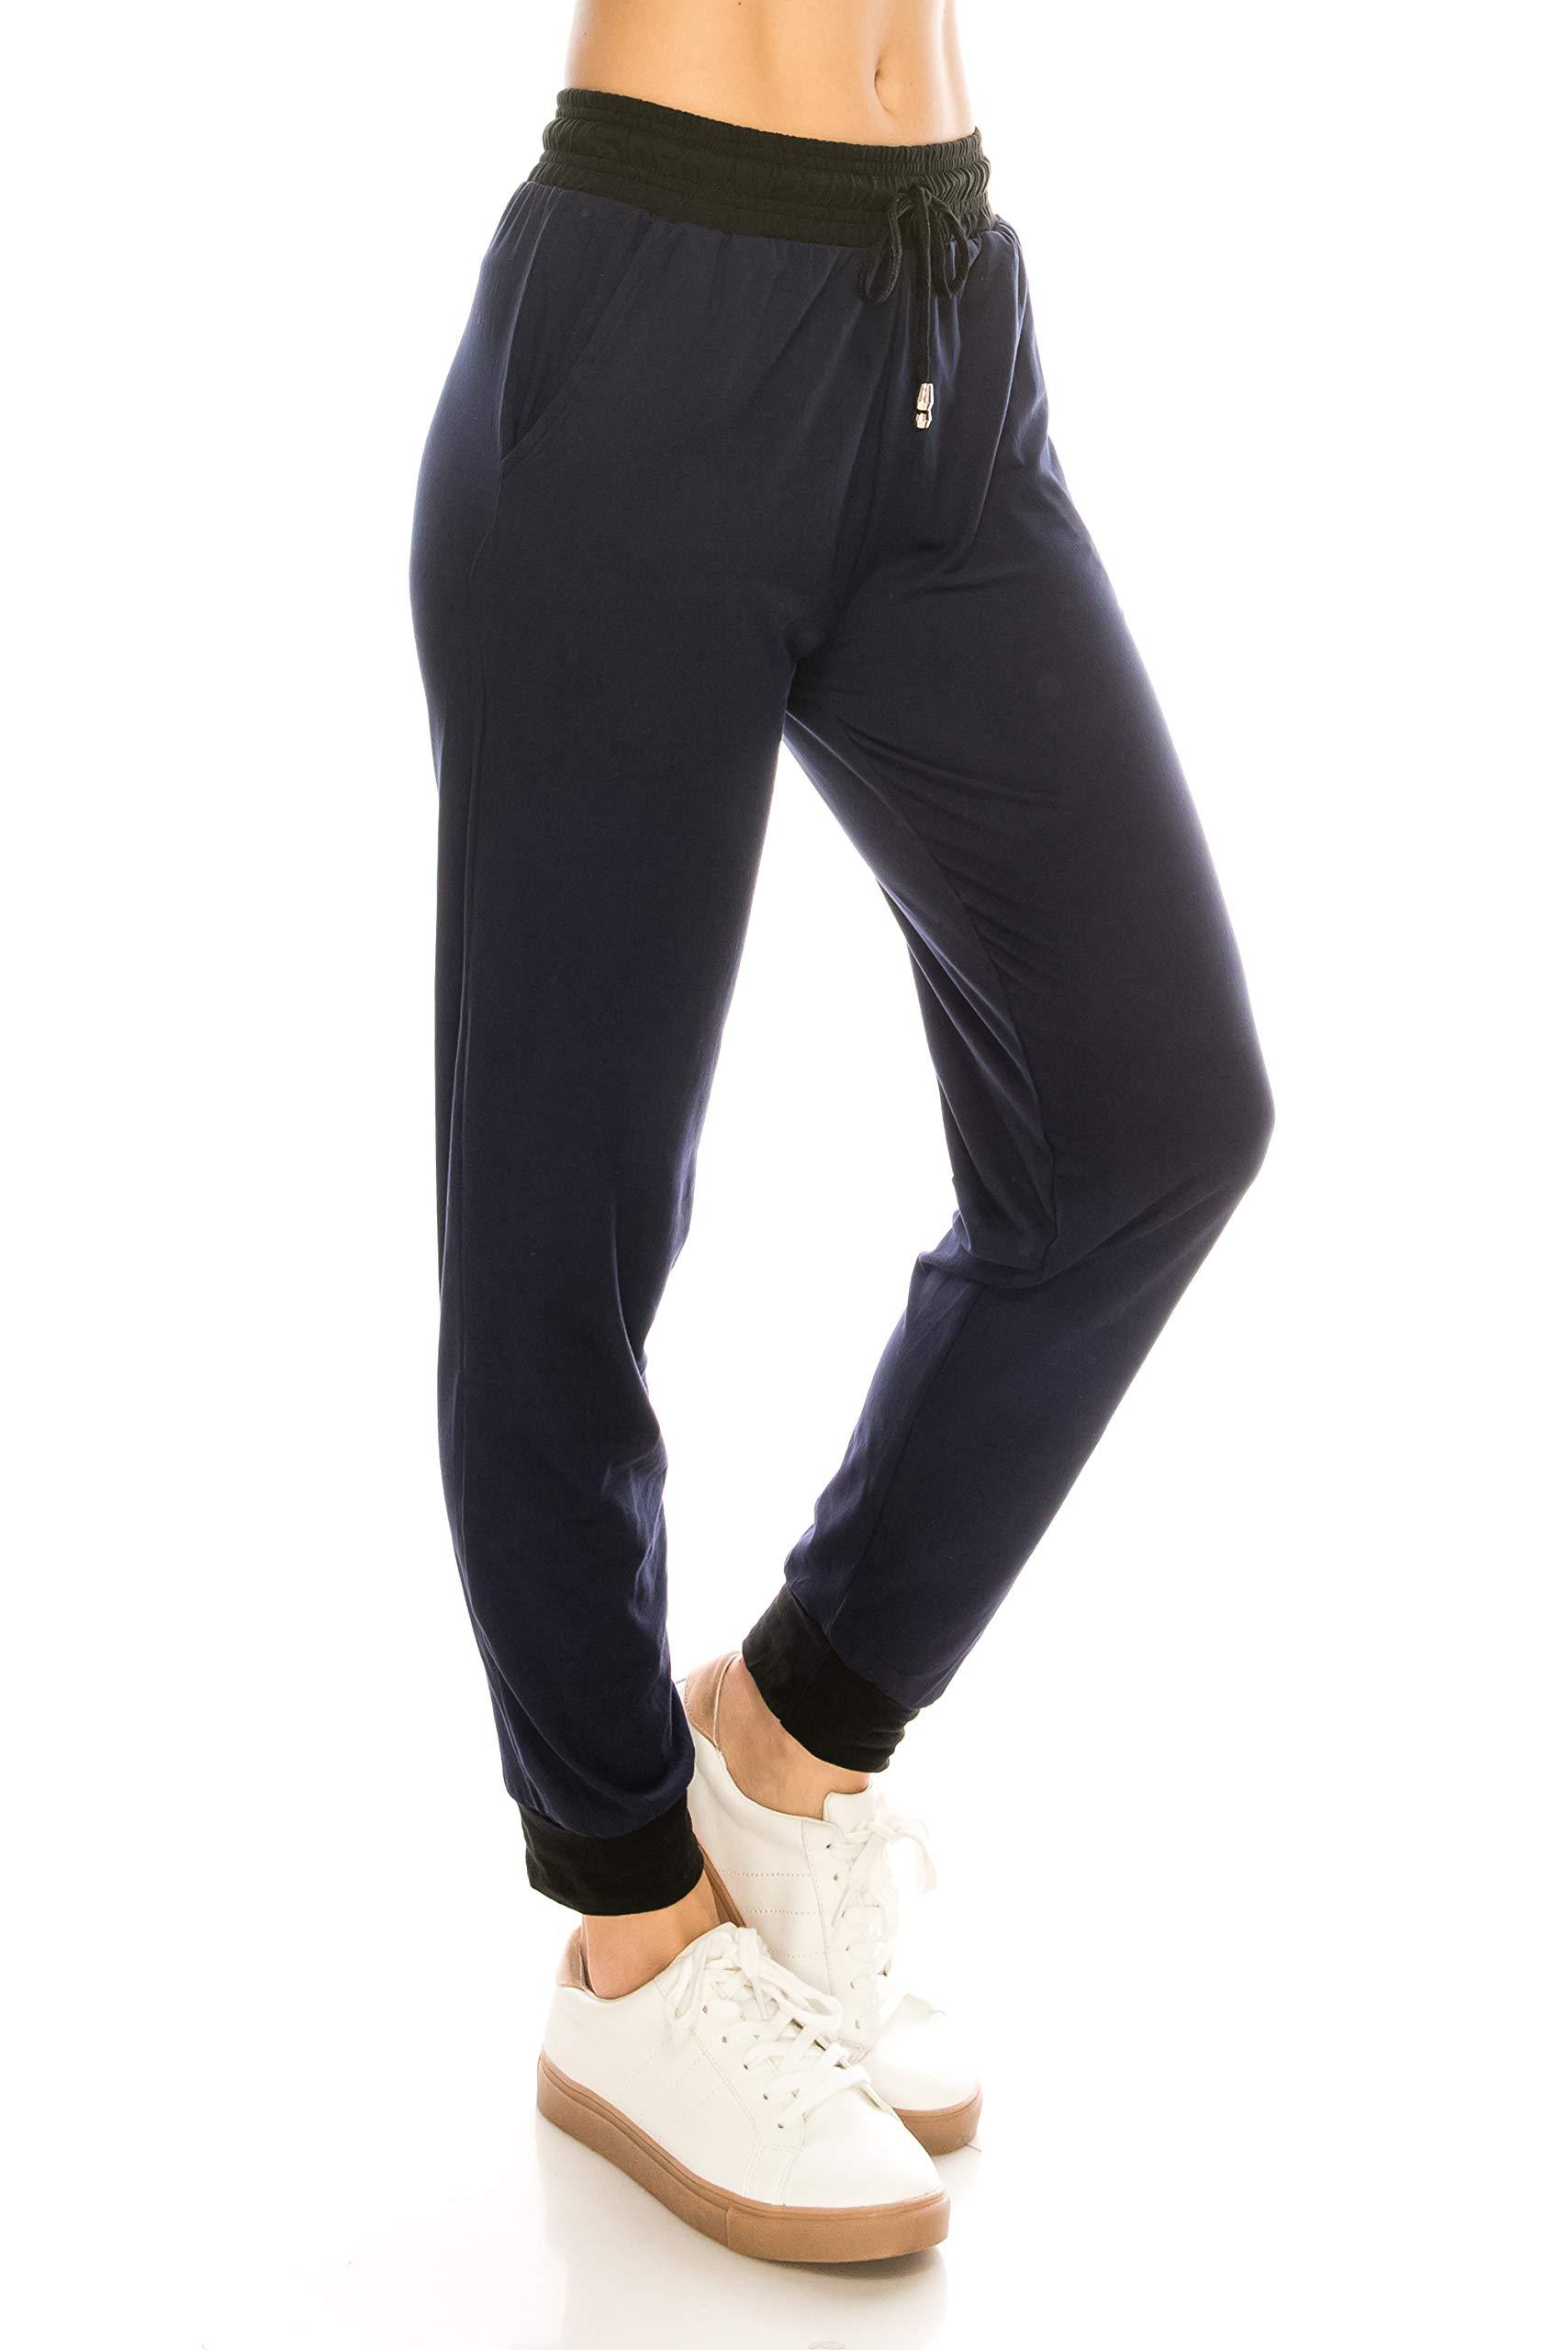 ALWAYS Women Drawstrings Jogger Pants - Skinny Solid Basic Soft Stretch Pockets Sweatpants Navy L/XL